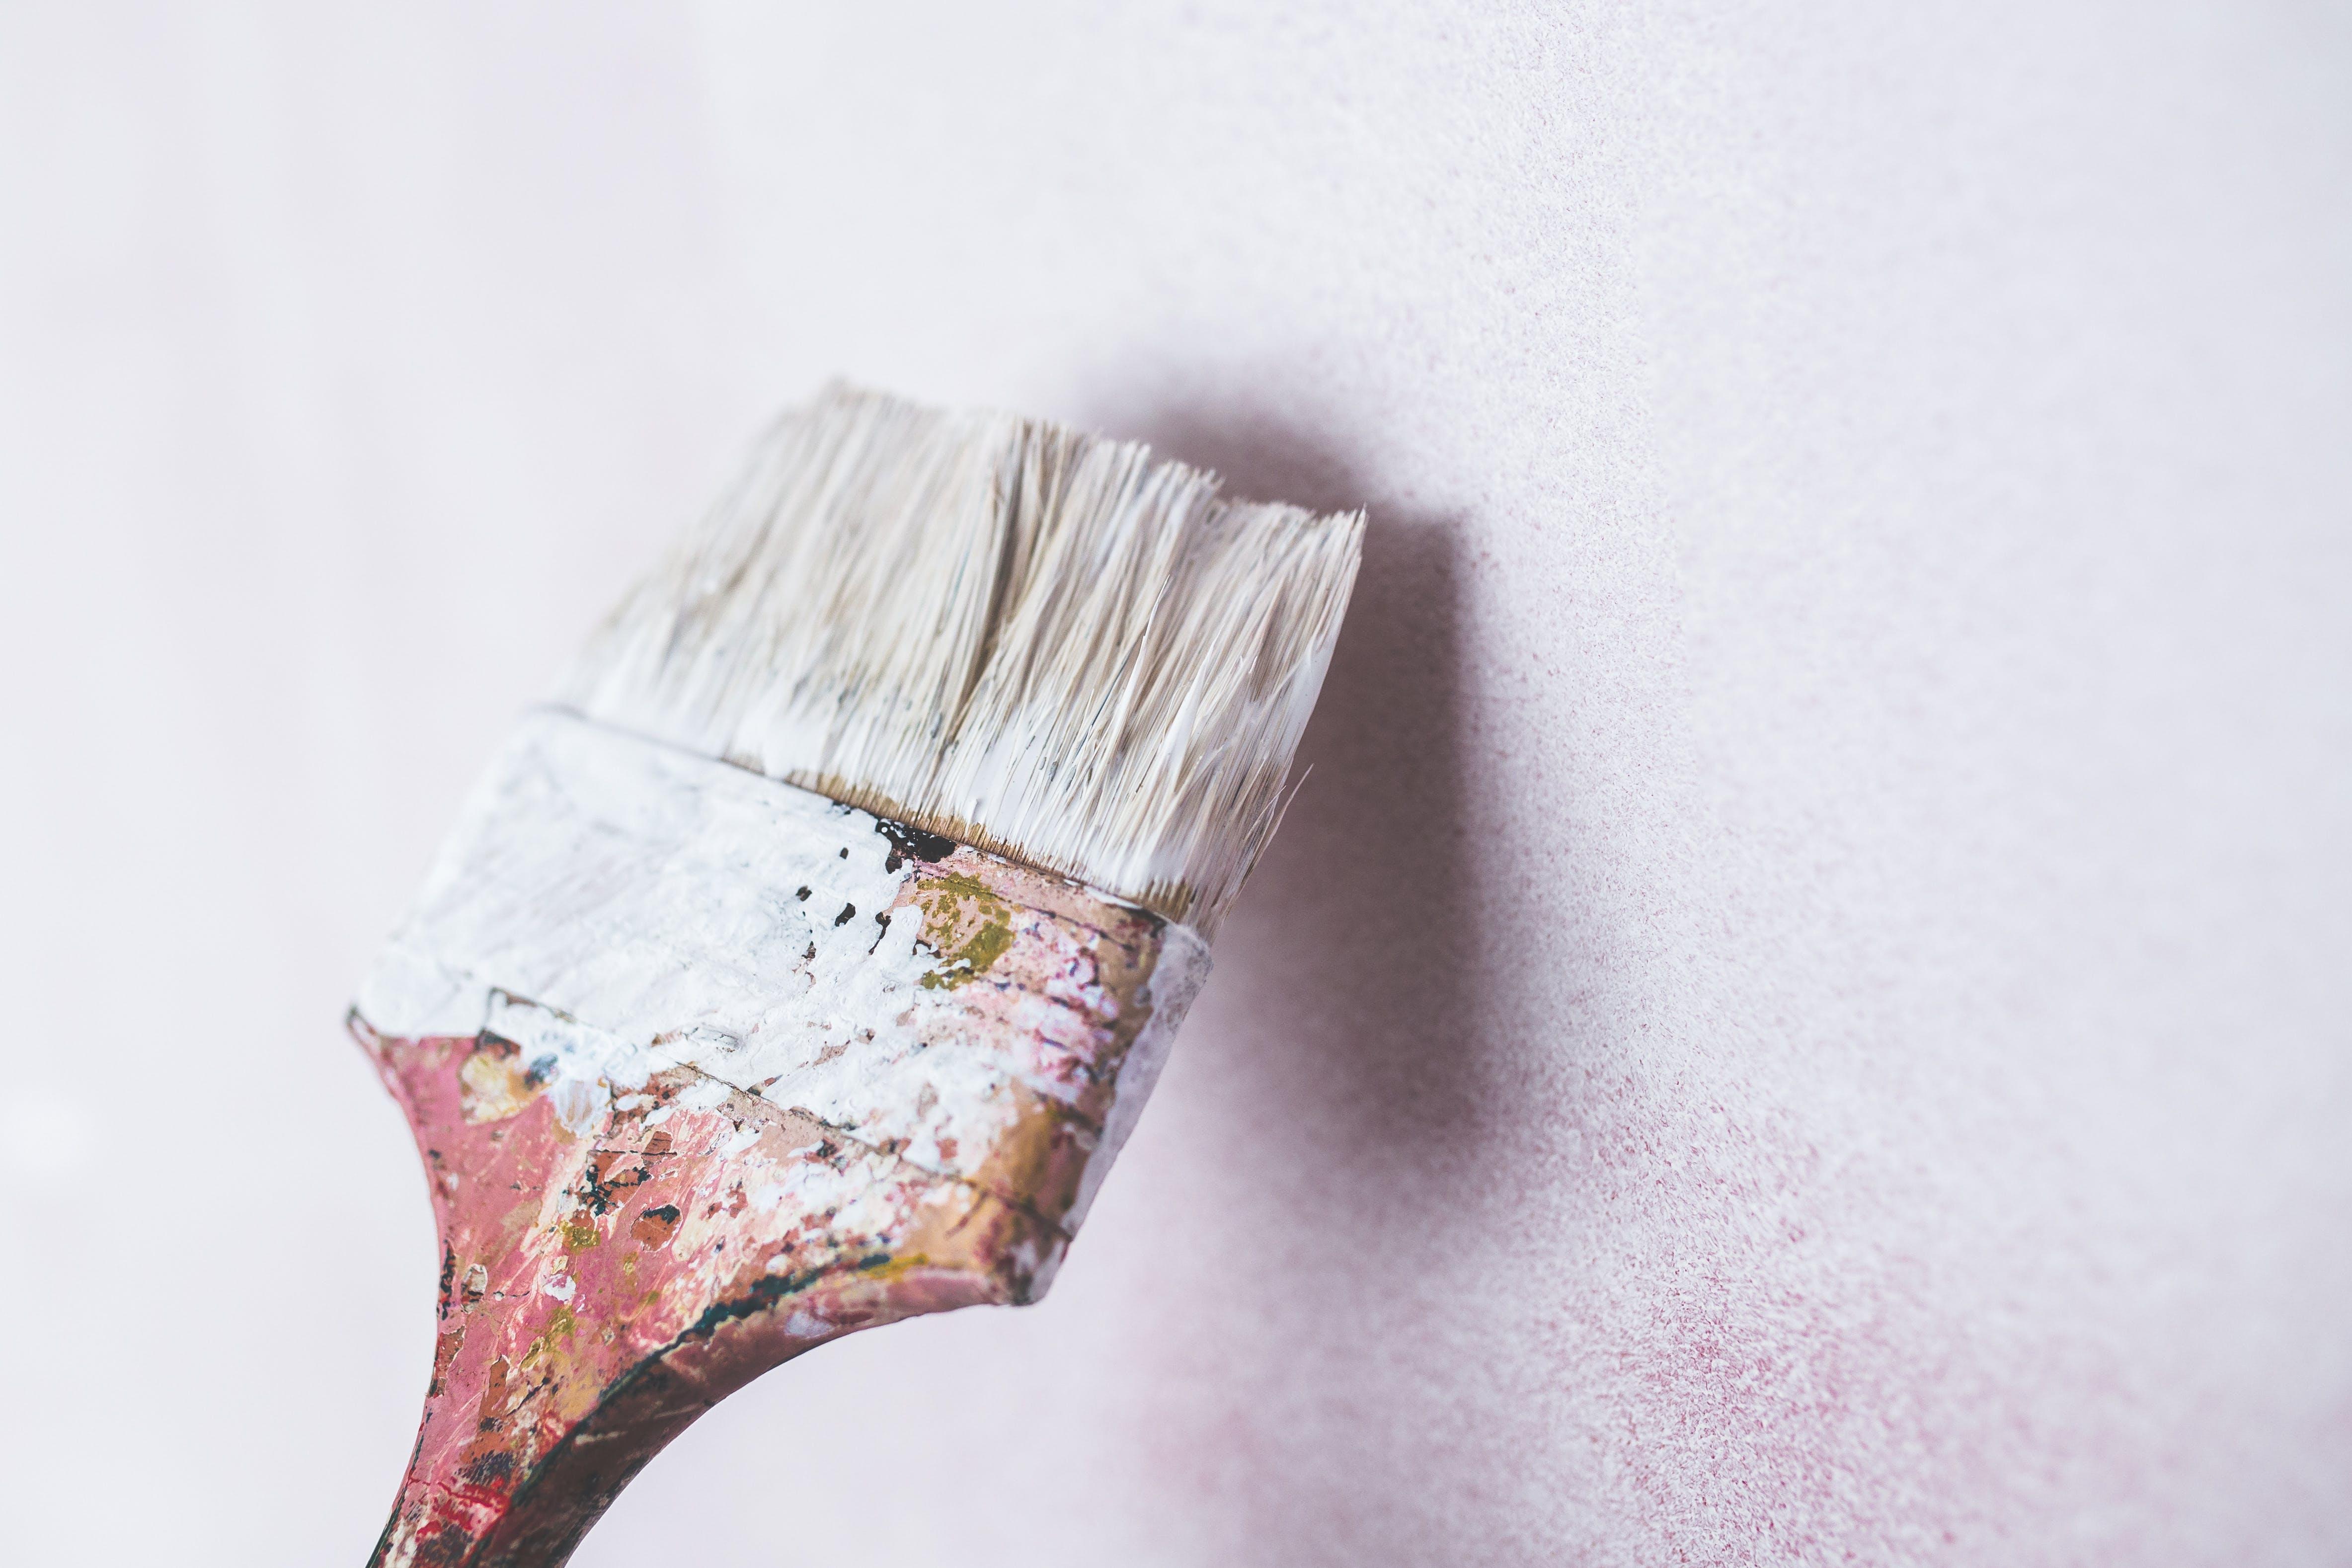 Schimmel an der Wand? Anti-Schimmel-Farbe könnte helfen